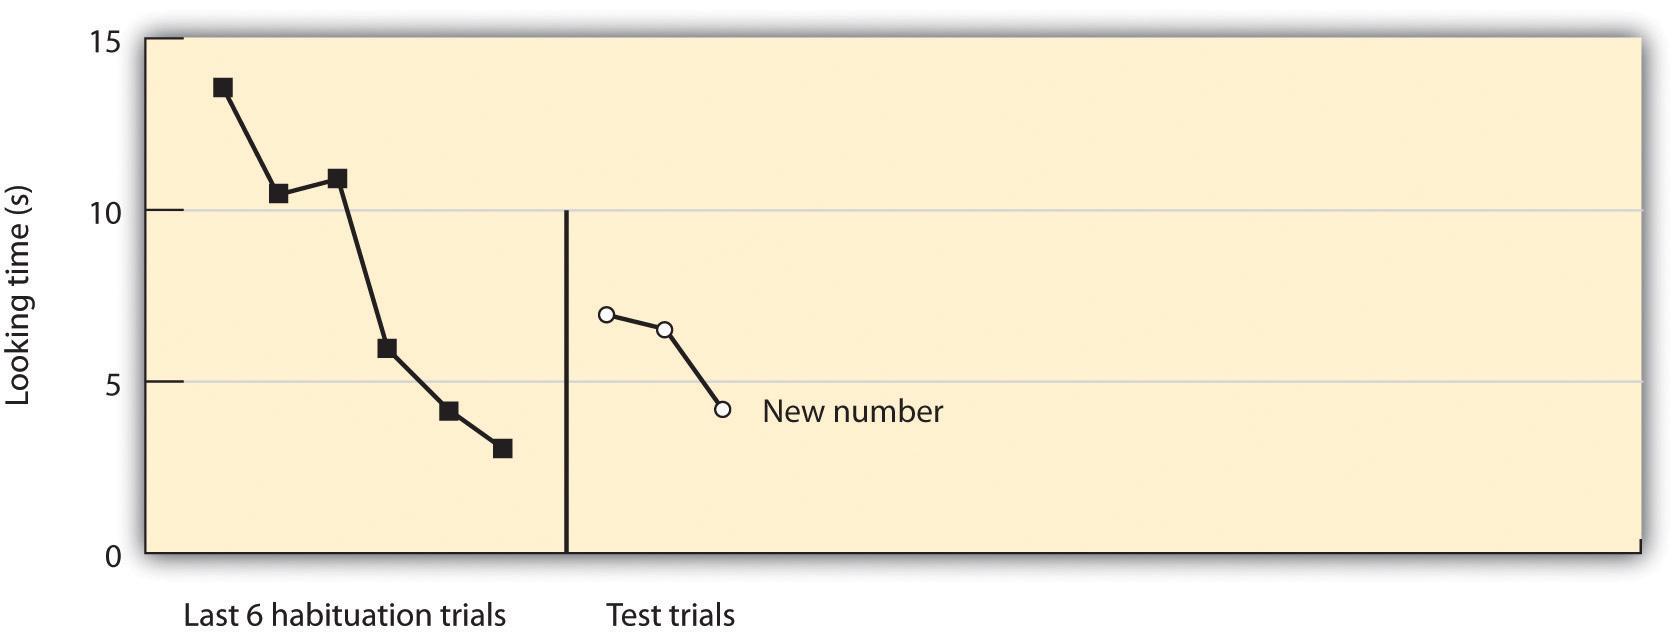 Piaget Theory Graph